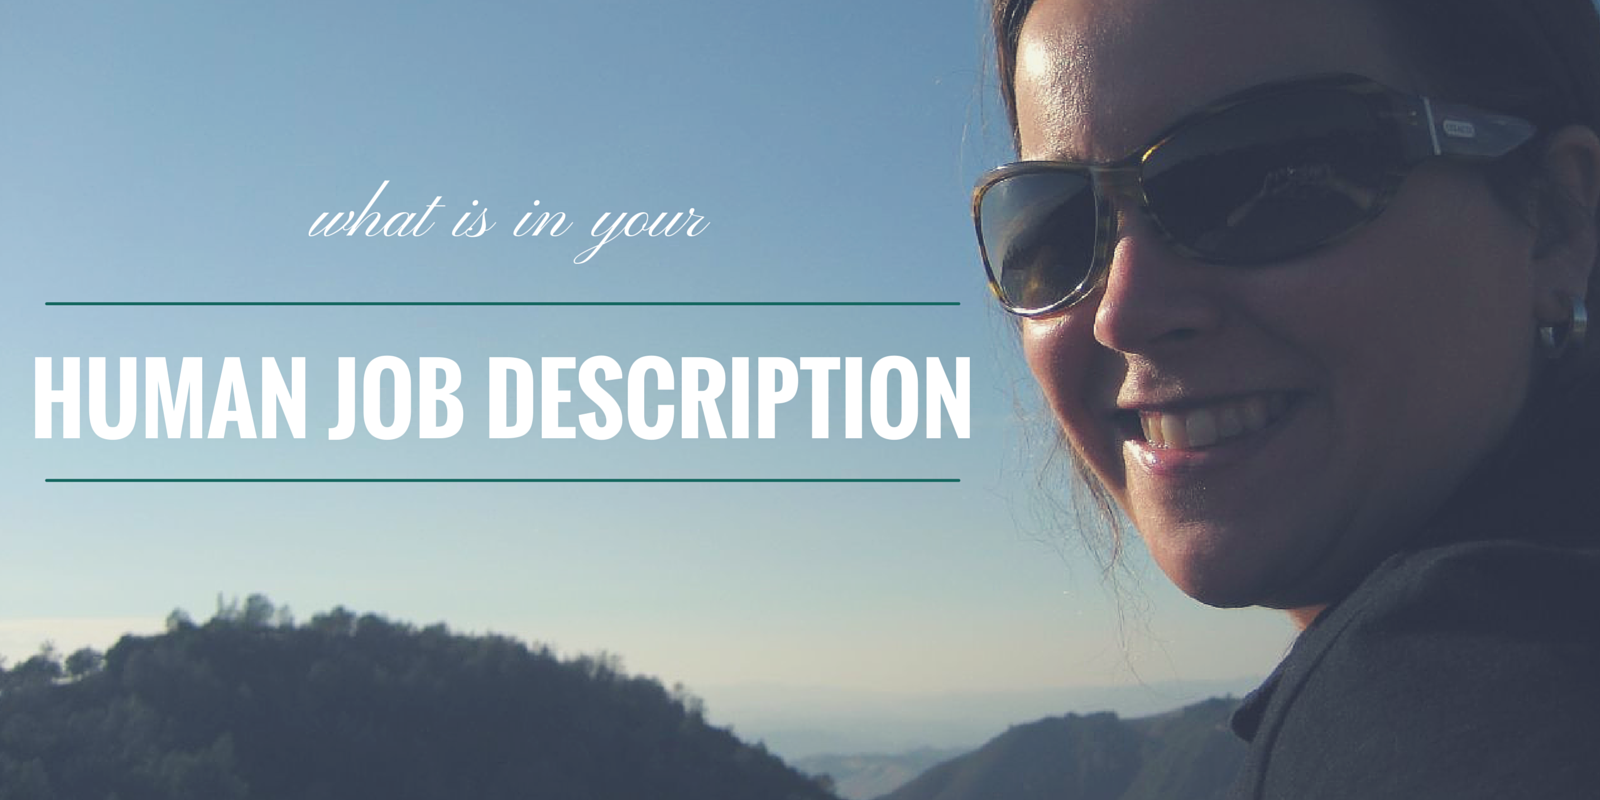 what's in your human job description?